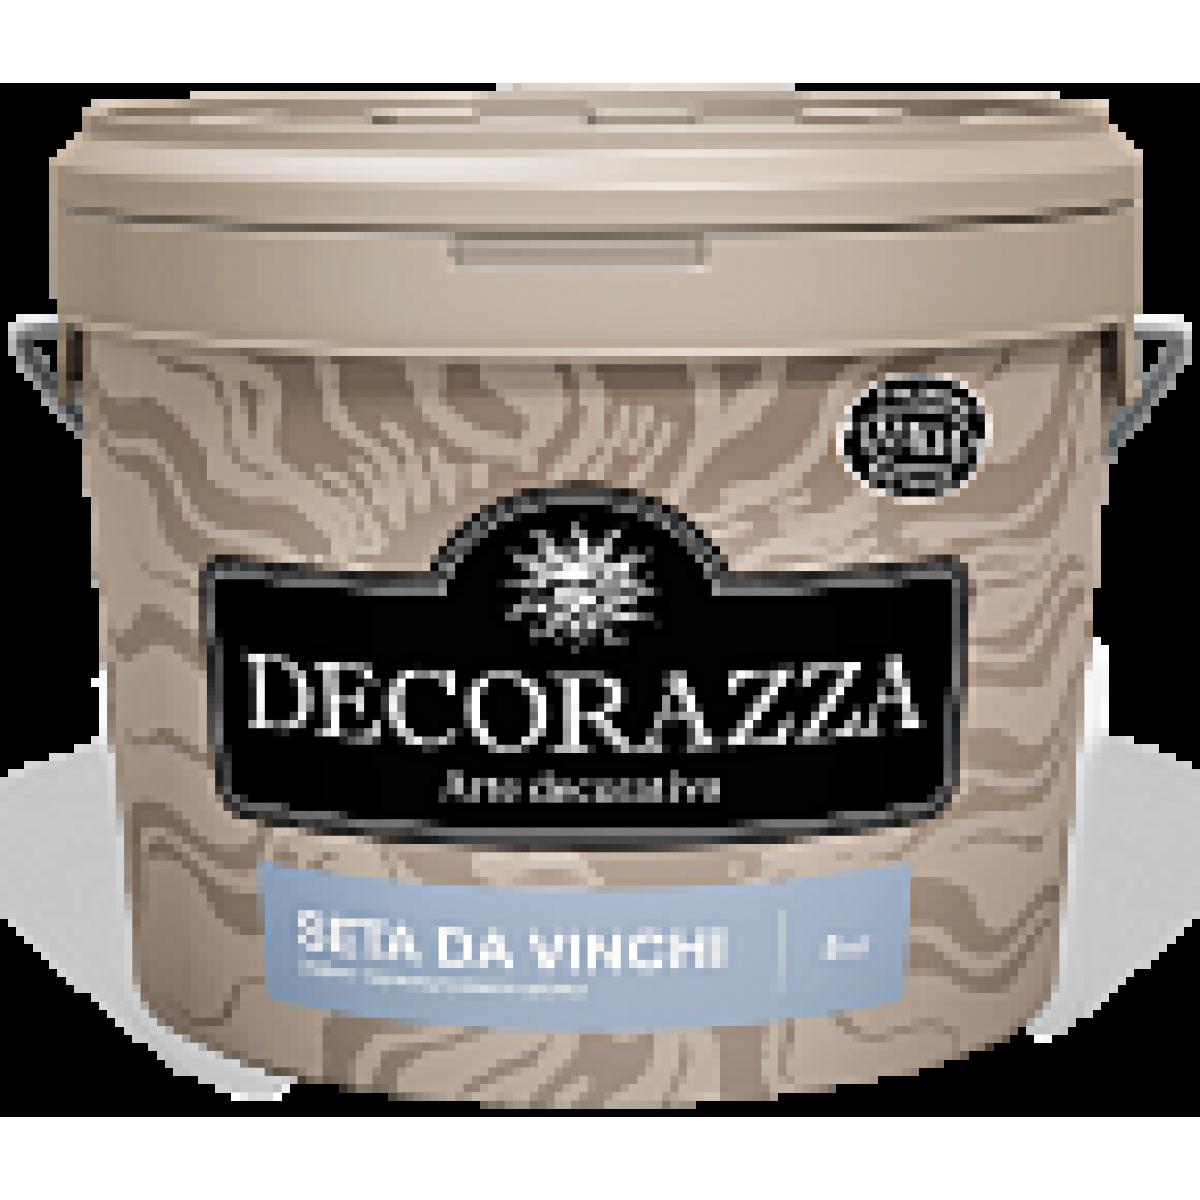 Decorazza Seta da vinci - Эффект перламутрового шёлка